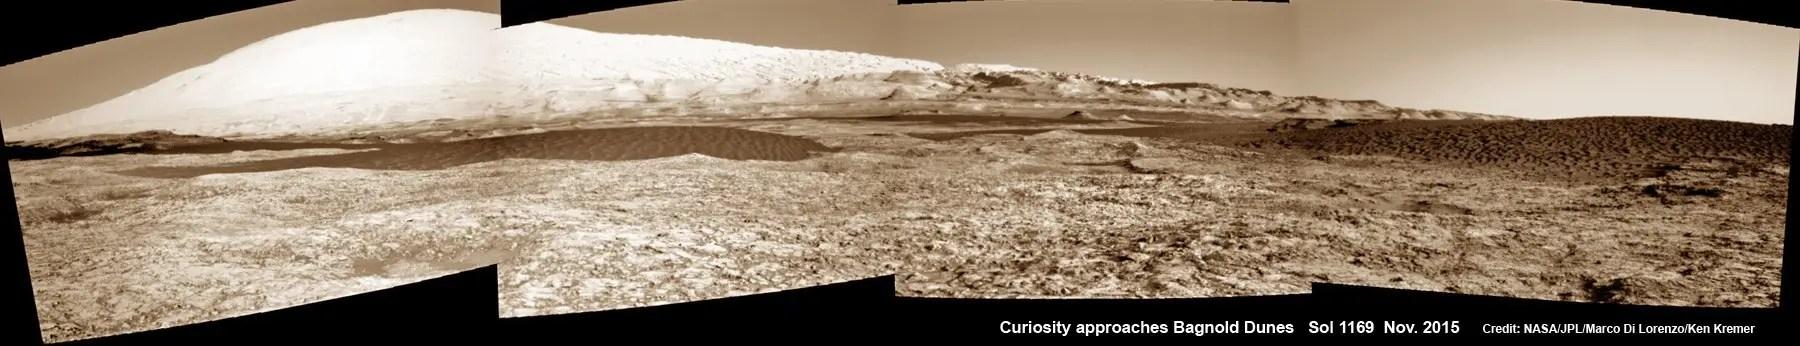 Curiosity Sol 1169_2b_Ken Kremer